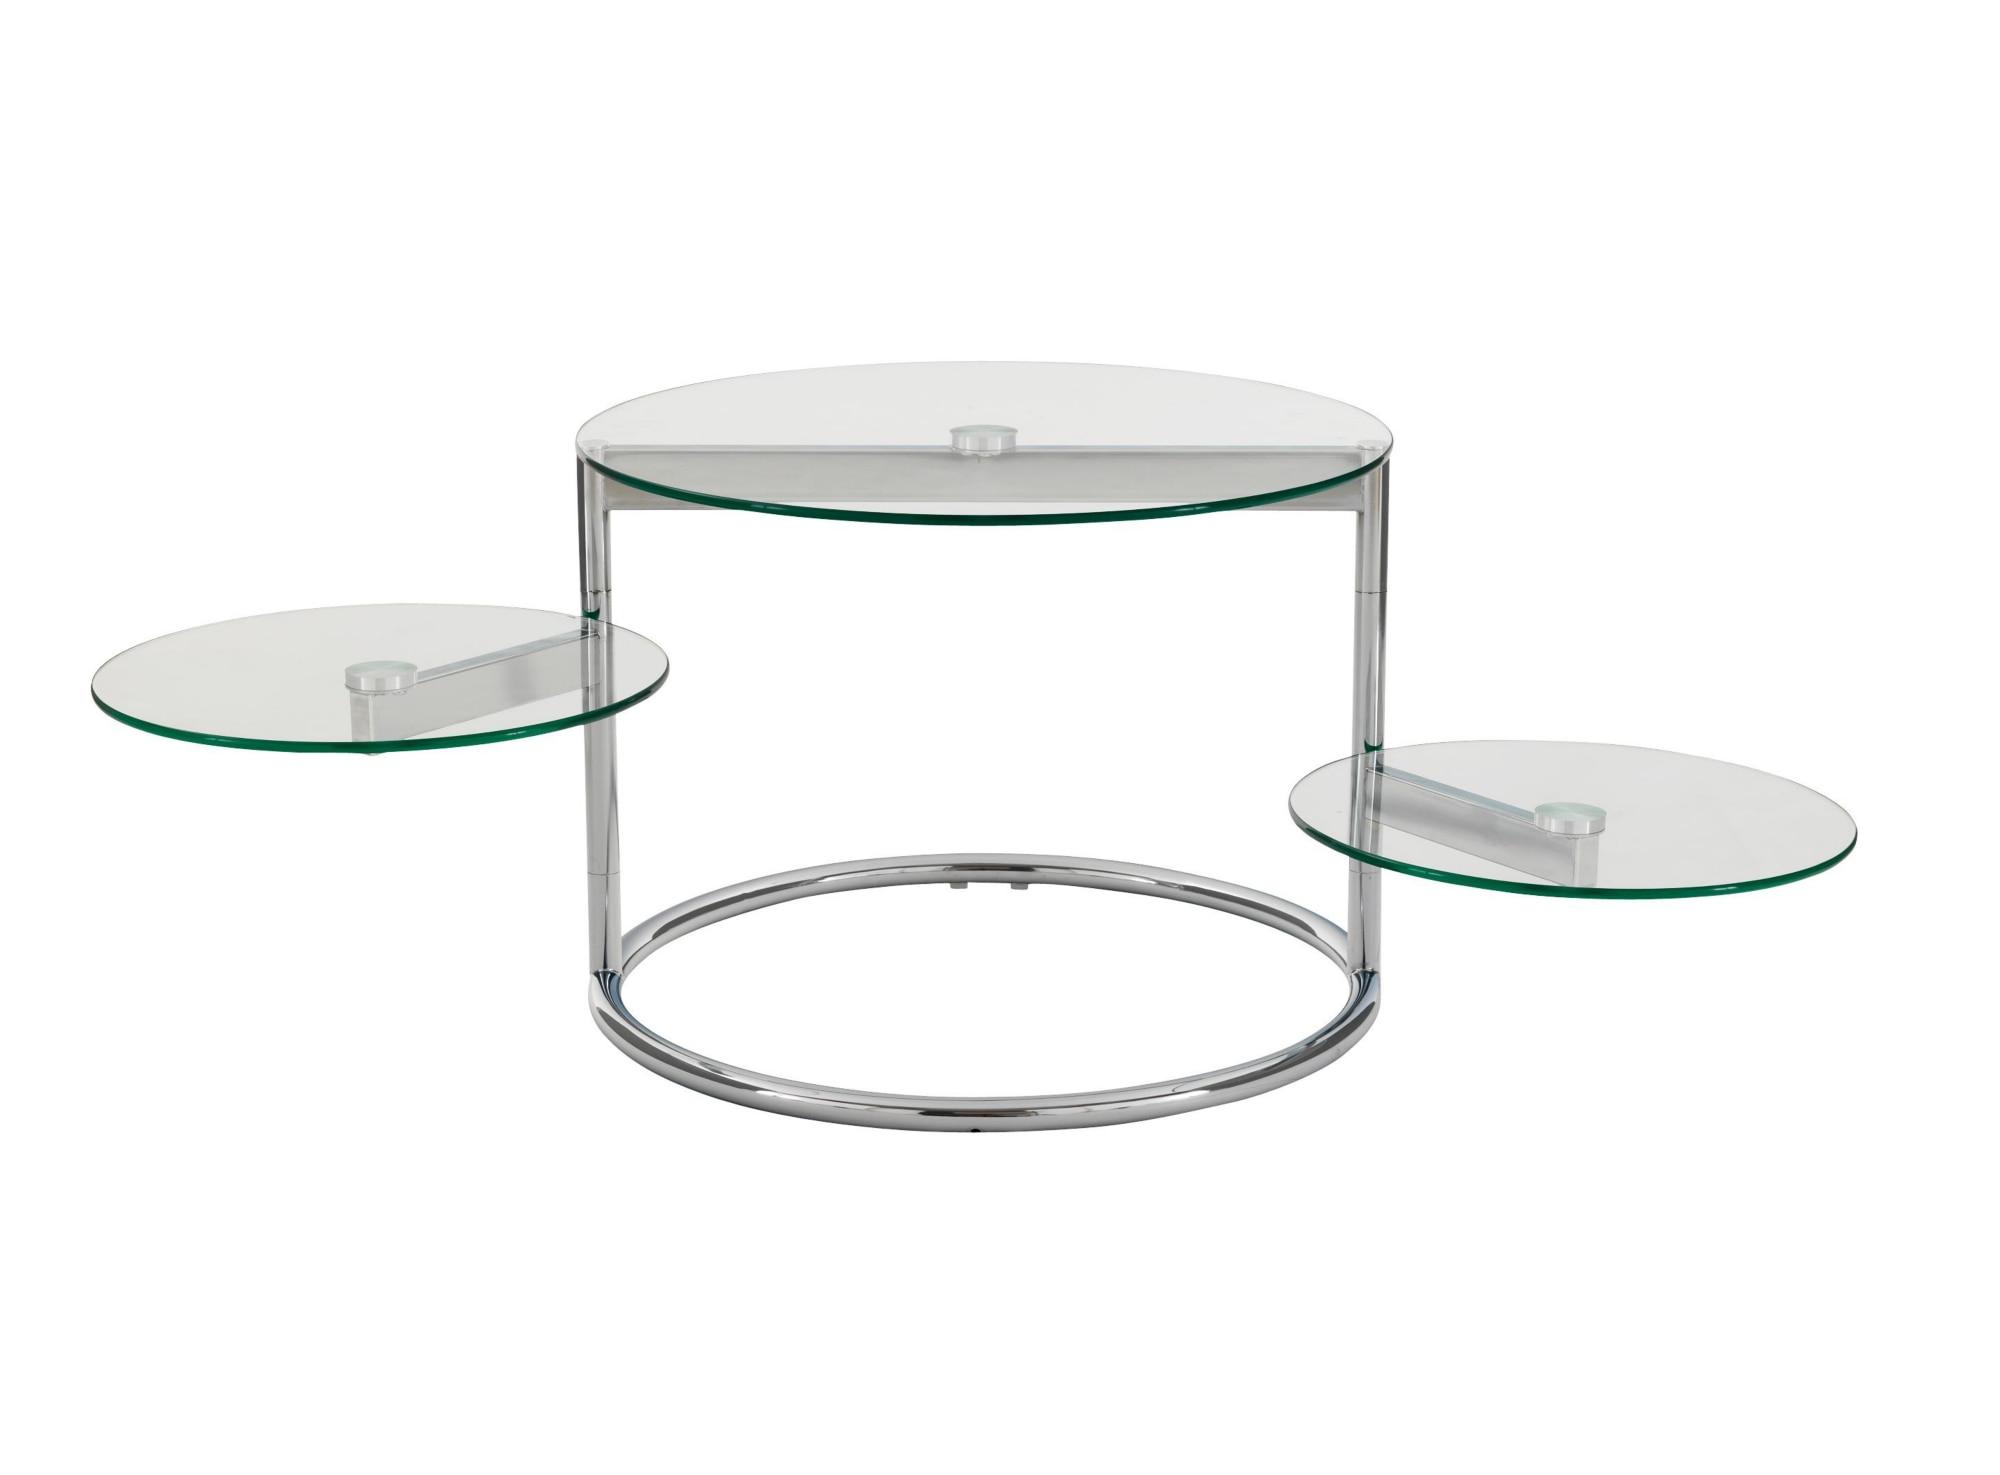 Table Basse Verre Design Roche Bobois Atwebsterfr Maison Et